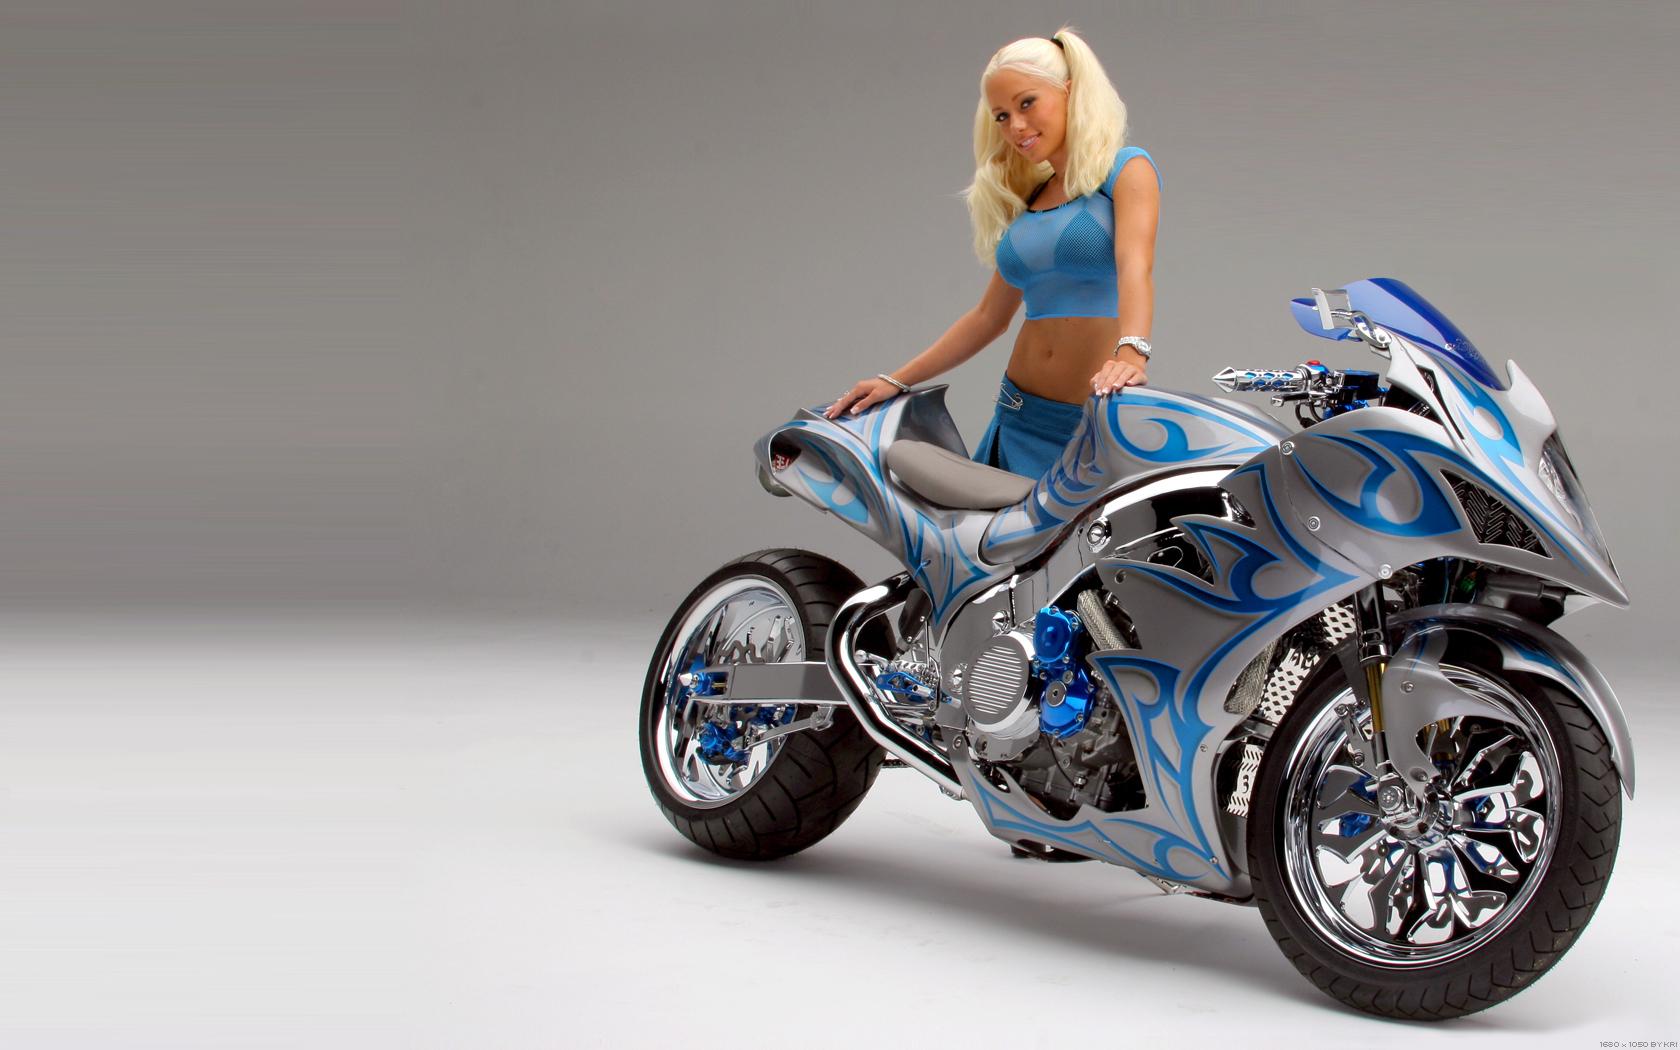 GIRL BIKE   Motorcycles Wallpaper 14635722 1680x1050